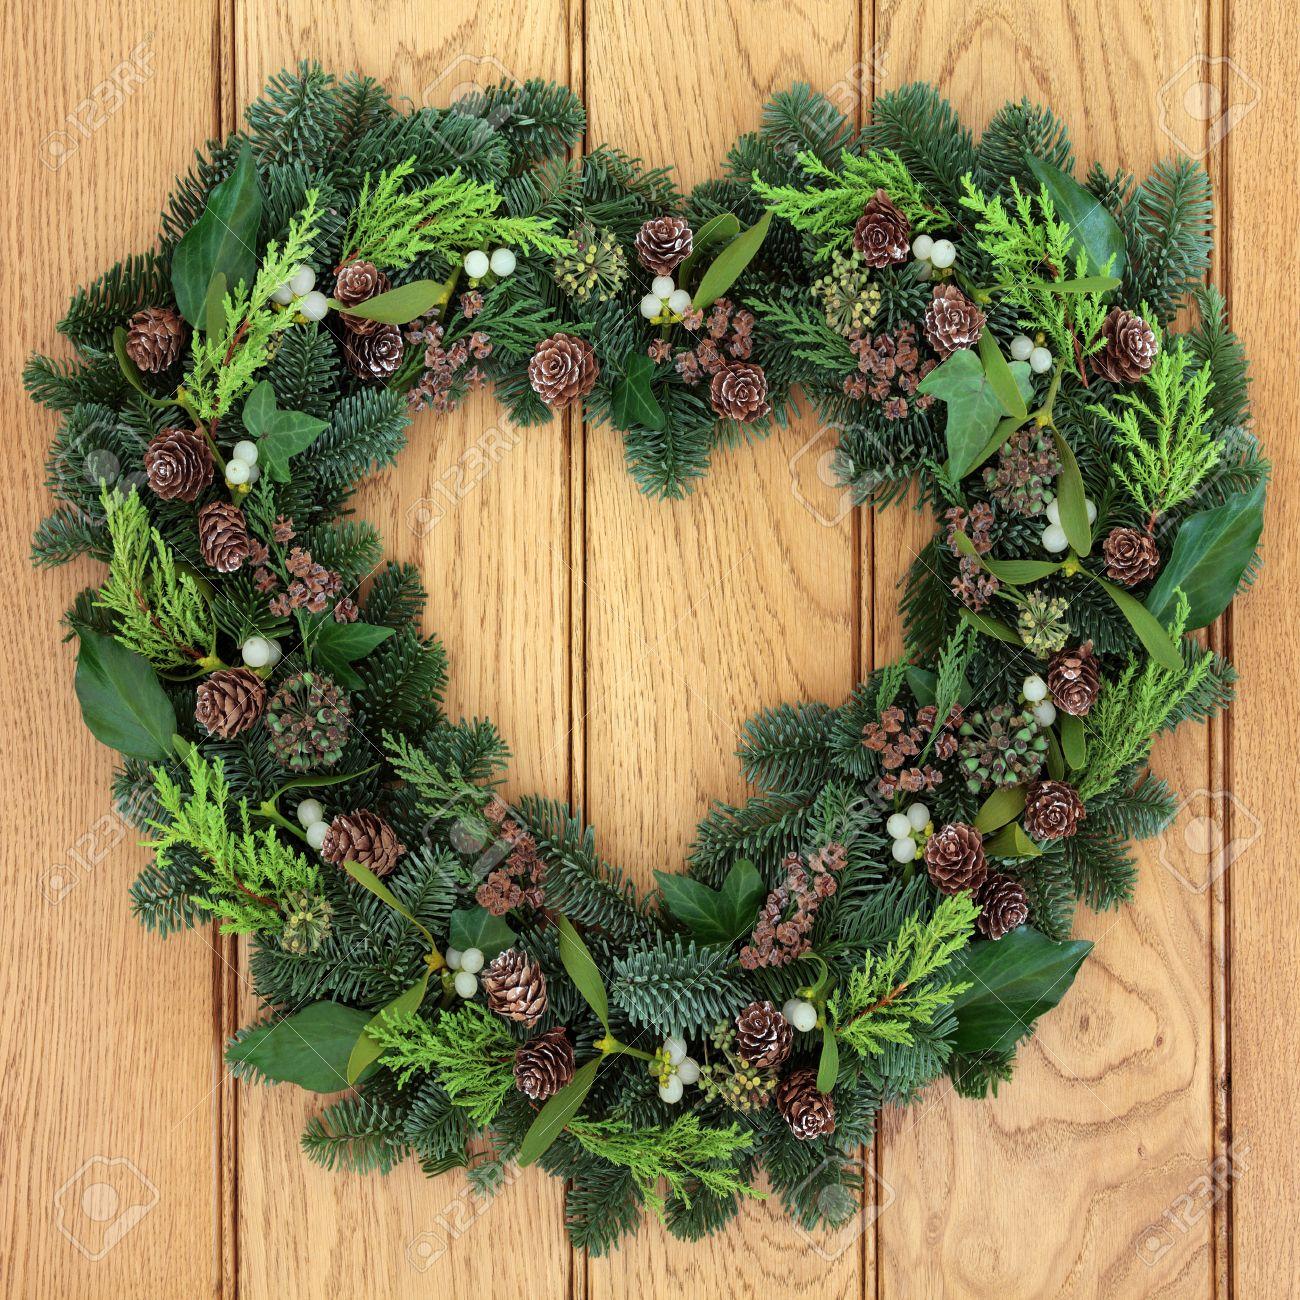 Winter and christmas heart shaped wreath with mistletoe and winter and christmas heart shaped wreath with mistletoe and greenery over oak front door background rubansaba